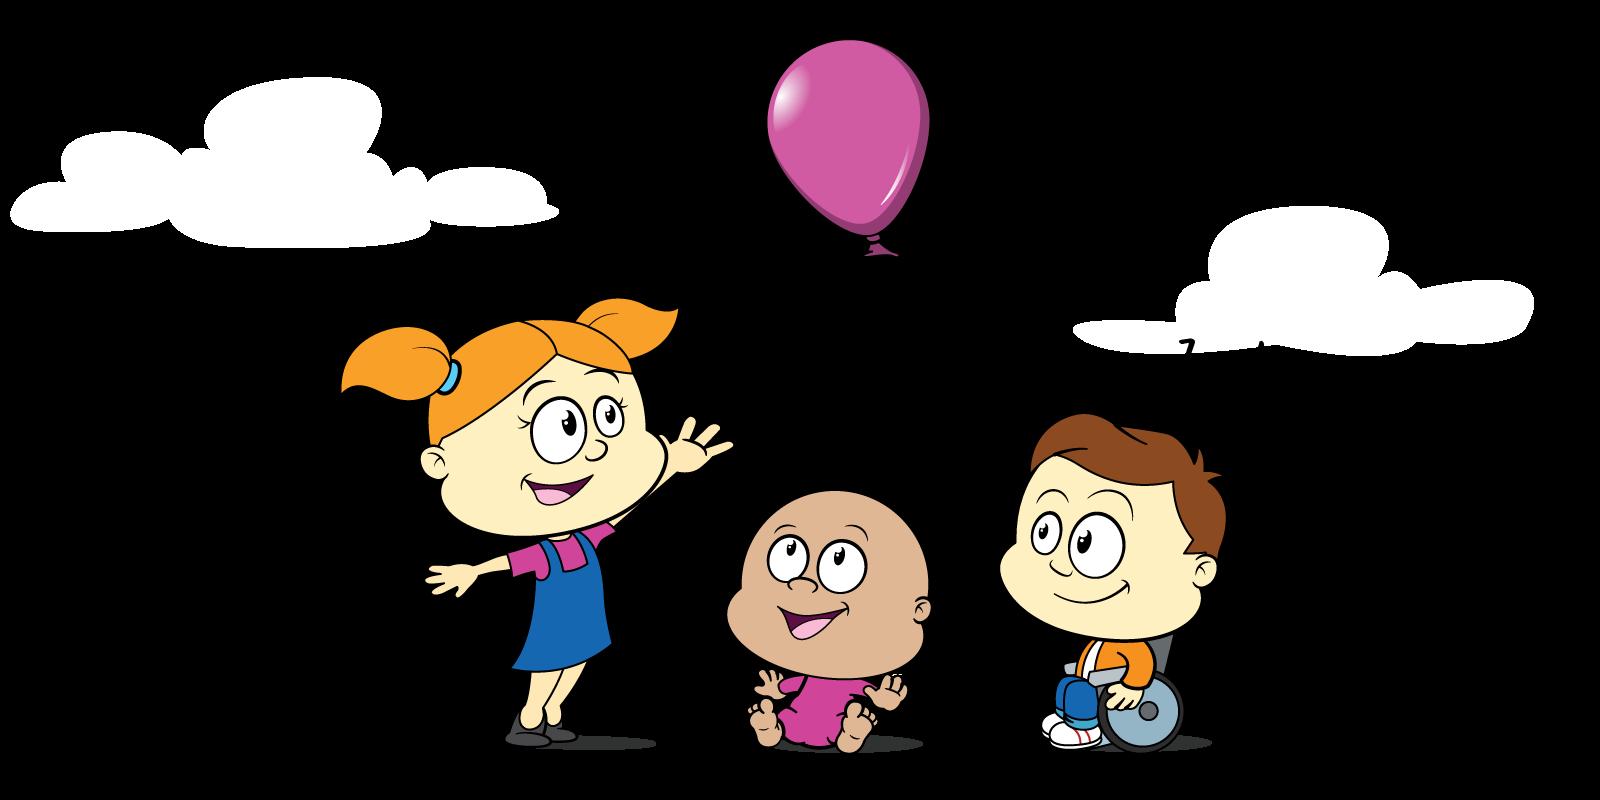 Children basking under sun clipart banner royalty free Storybook - Children's Activities Week banner royalty free